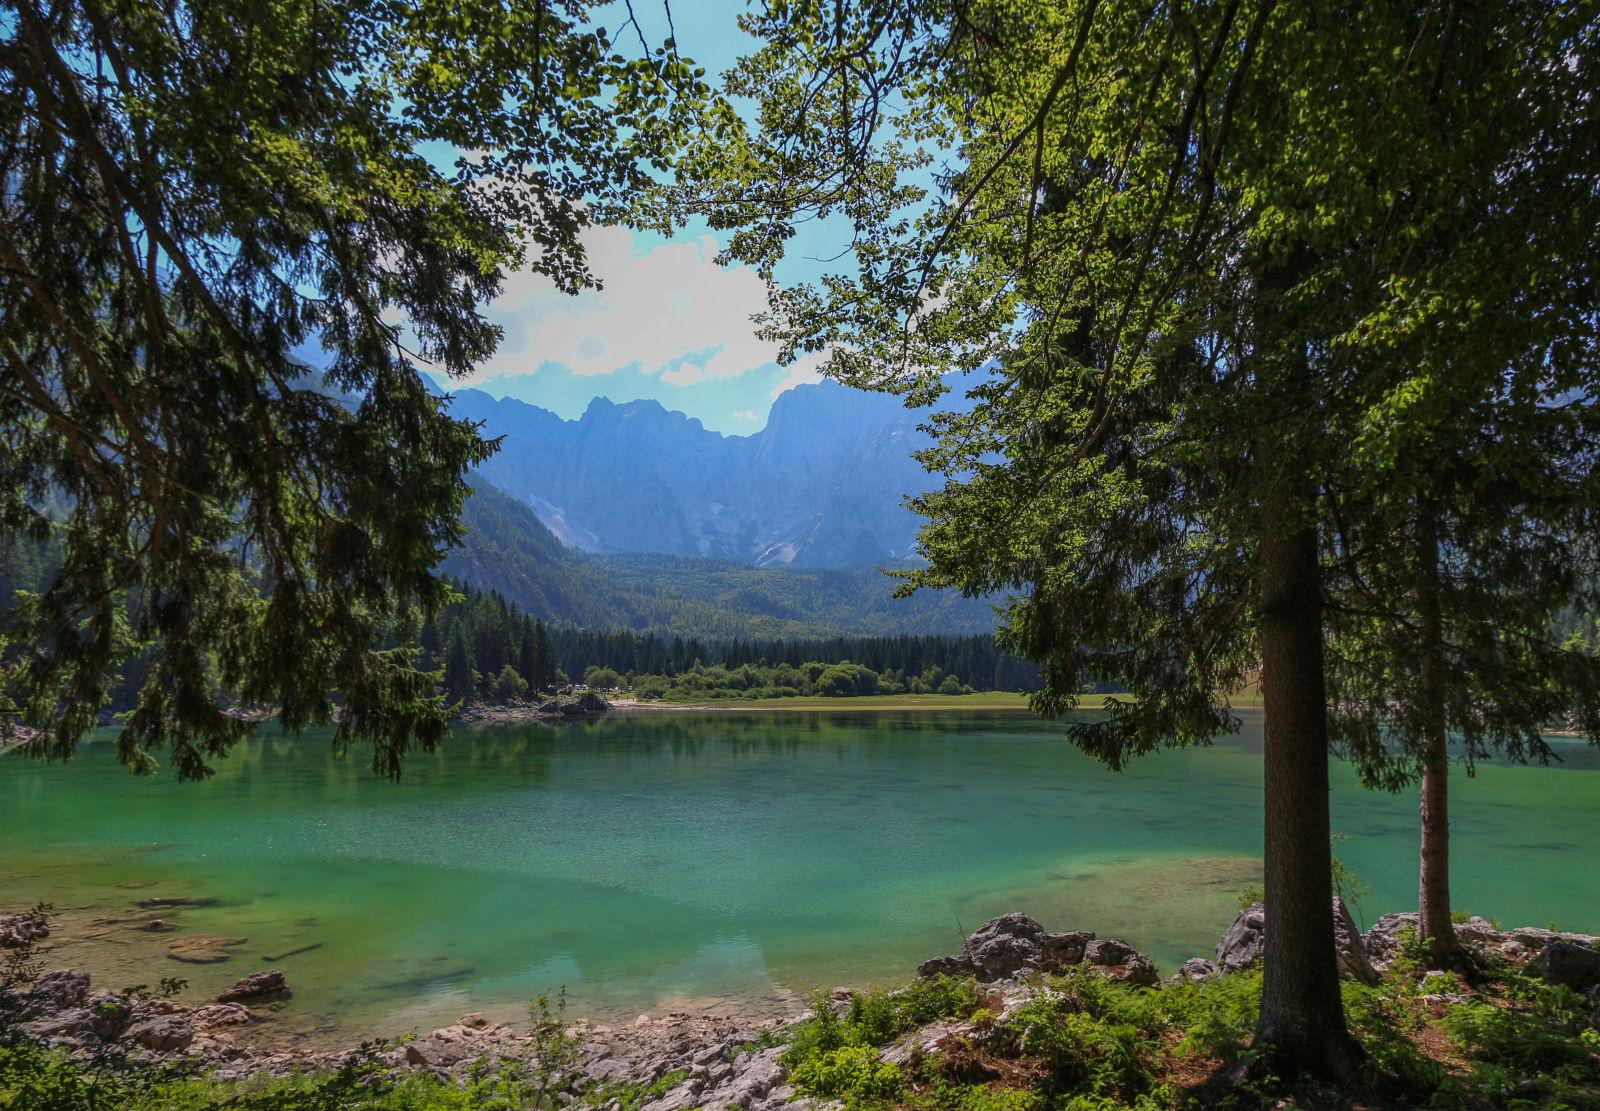 fusine-lakes-14-italy